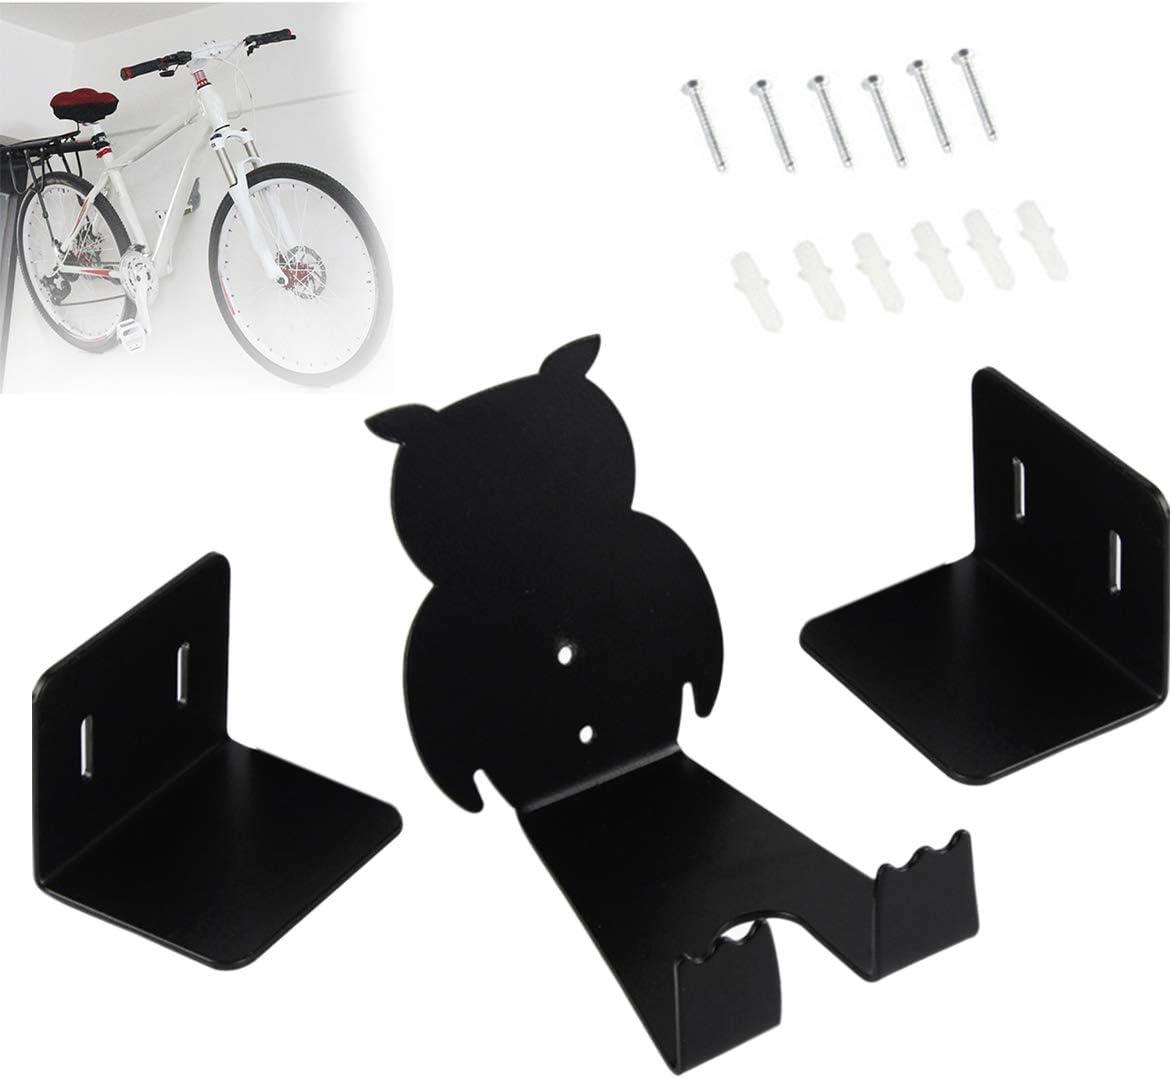 Soporte de pared para bicicleta, Pedal a soporte de pared Gancho para pedal Soporte de montaje en pared de metal Soporte de montaje en pared para estacionamiento (1 juego)